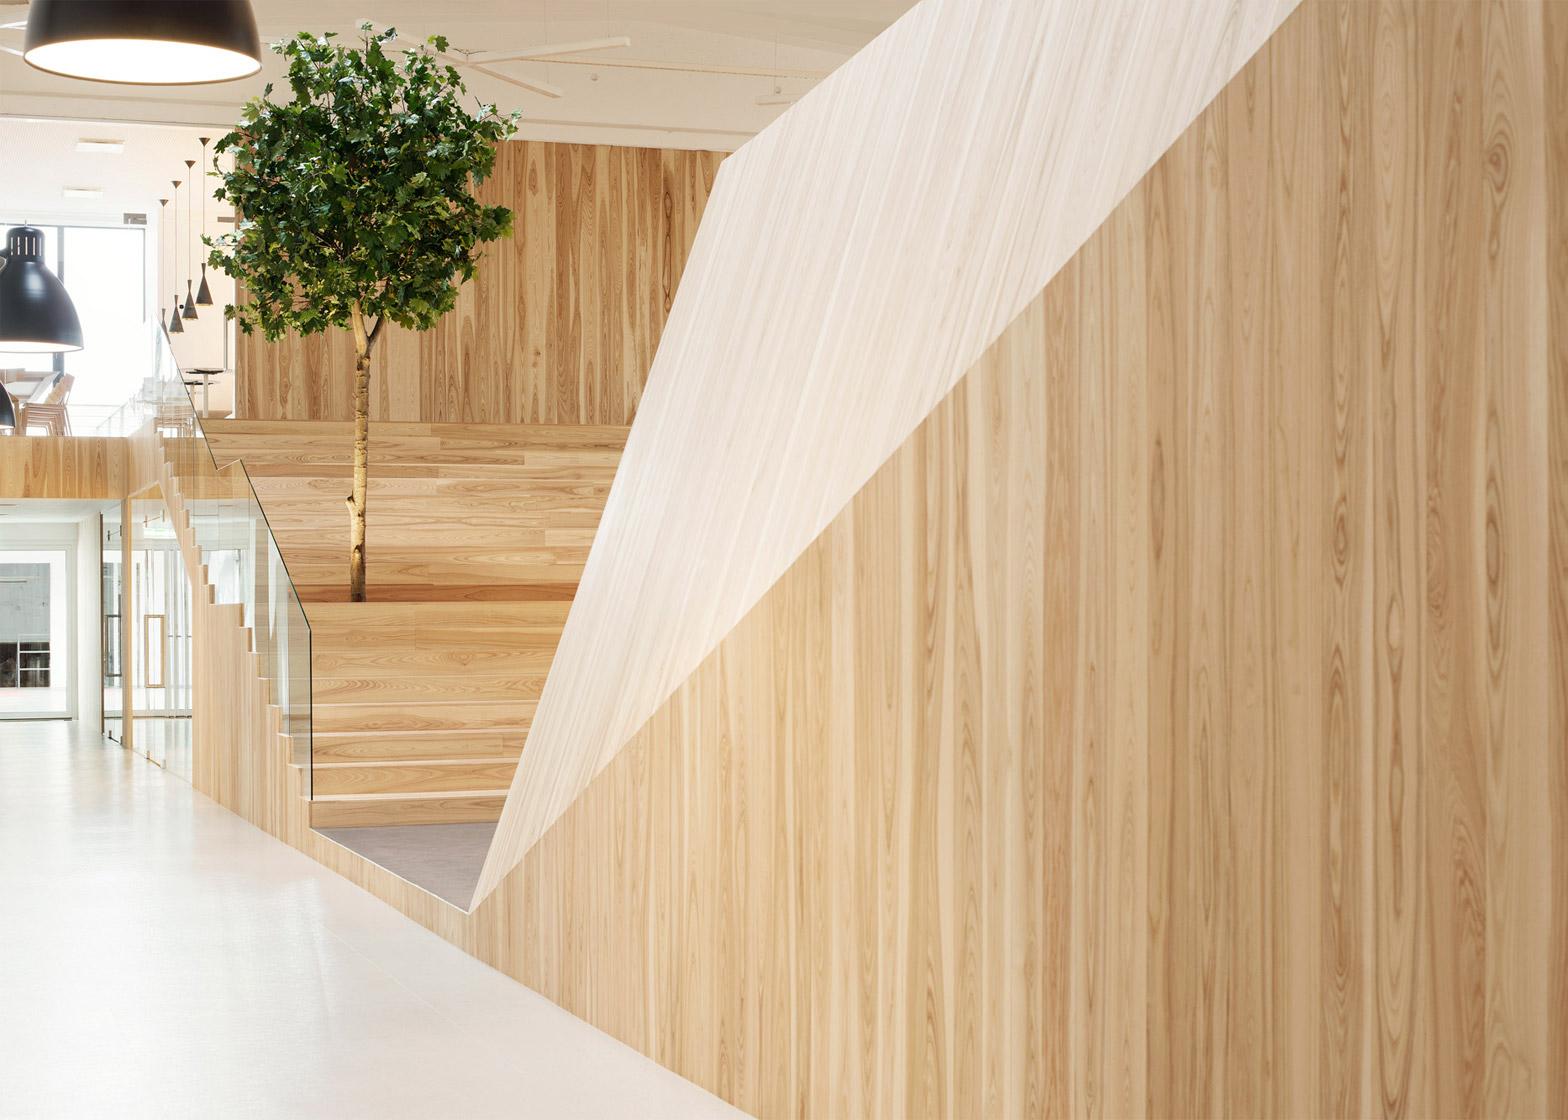 Office-Lenne_Estonia_KAMP-Arhitektid_dezeen_1568_5